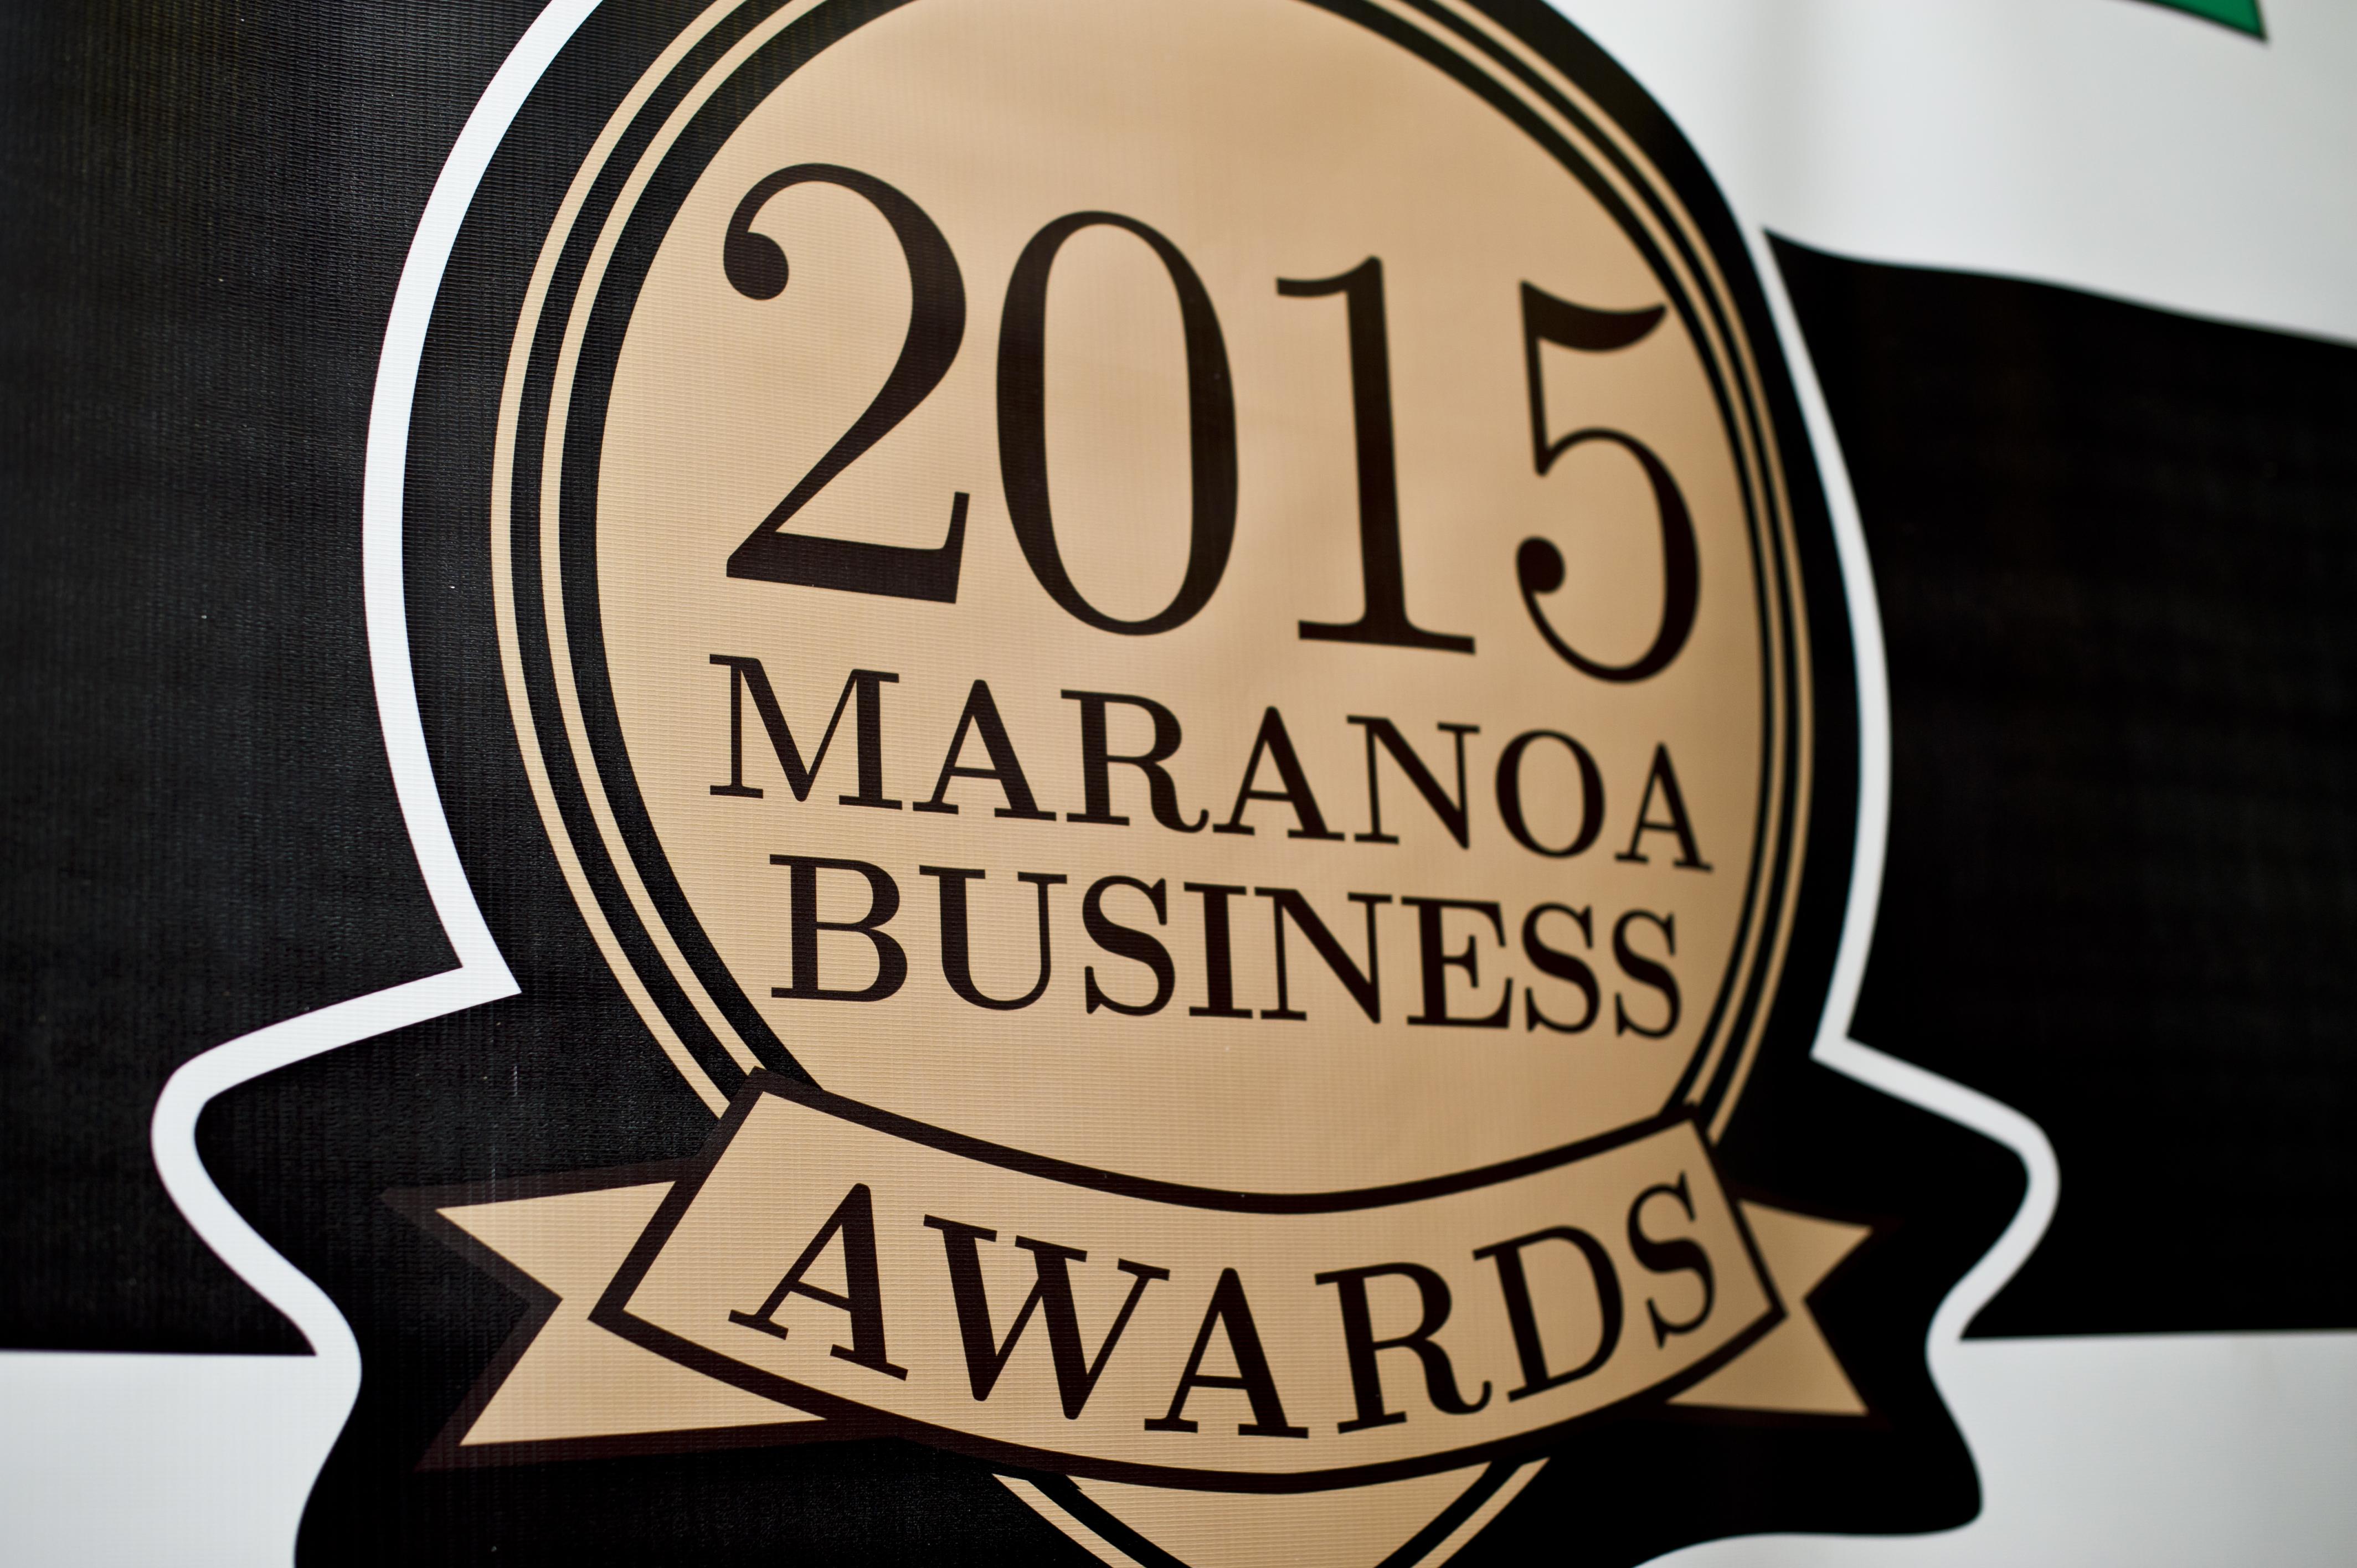 001_Maranoa Bus Awards - Copy